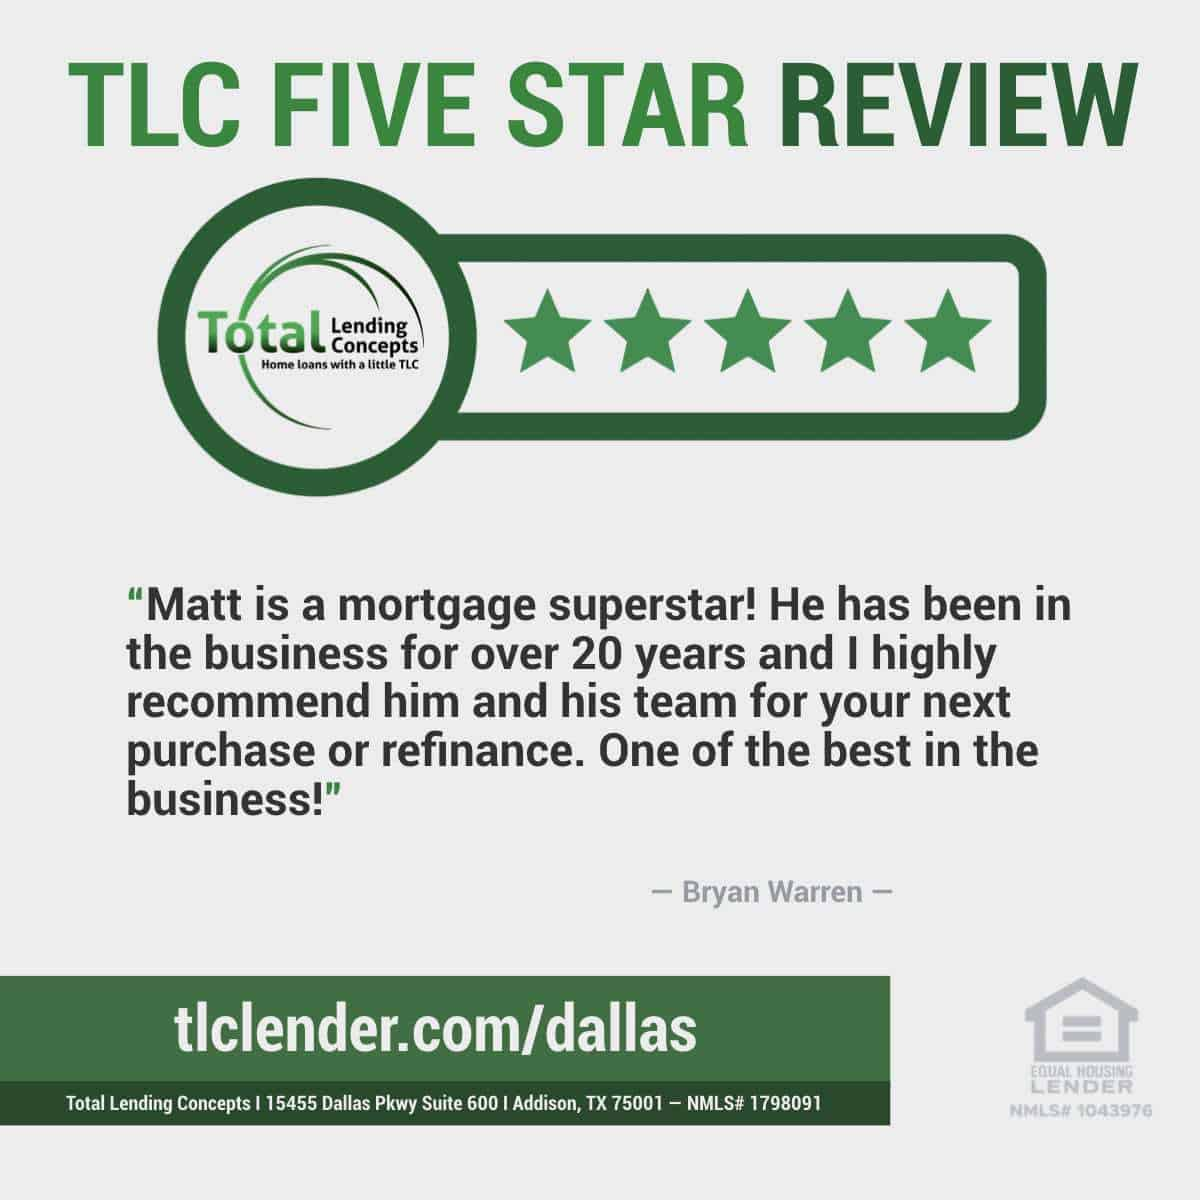 Total-Lending-Concepts-Five-Star-Review-Bryan-Warren-in-Addison-Texas-for-Matt-Home-Loan